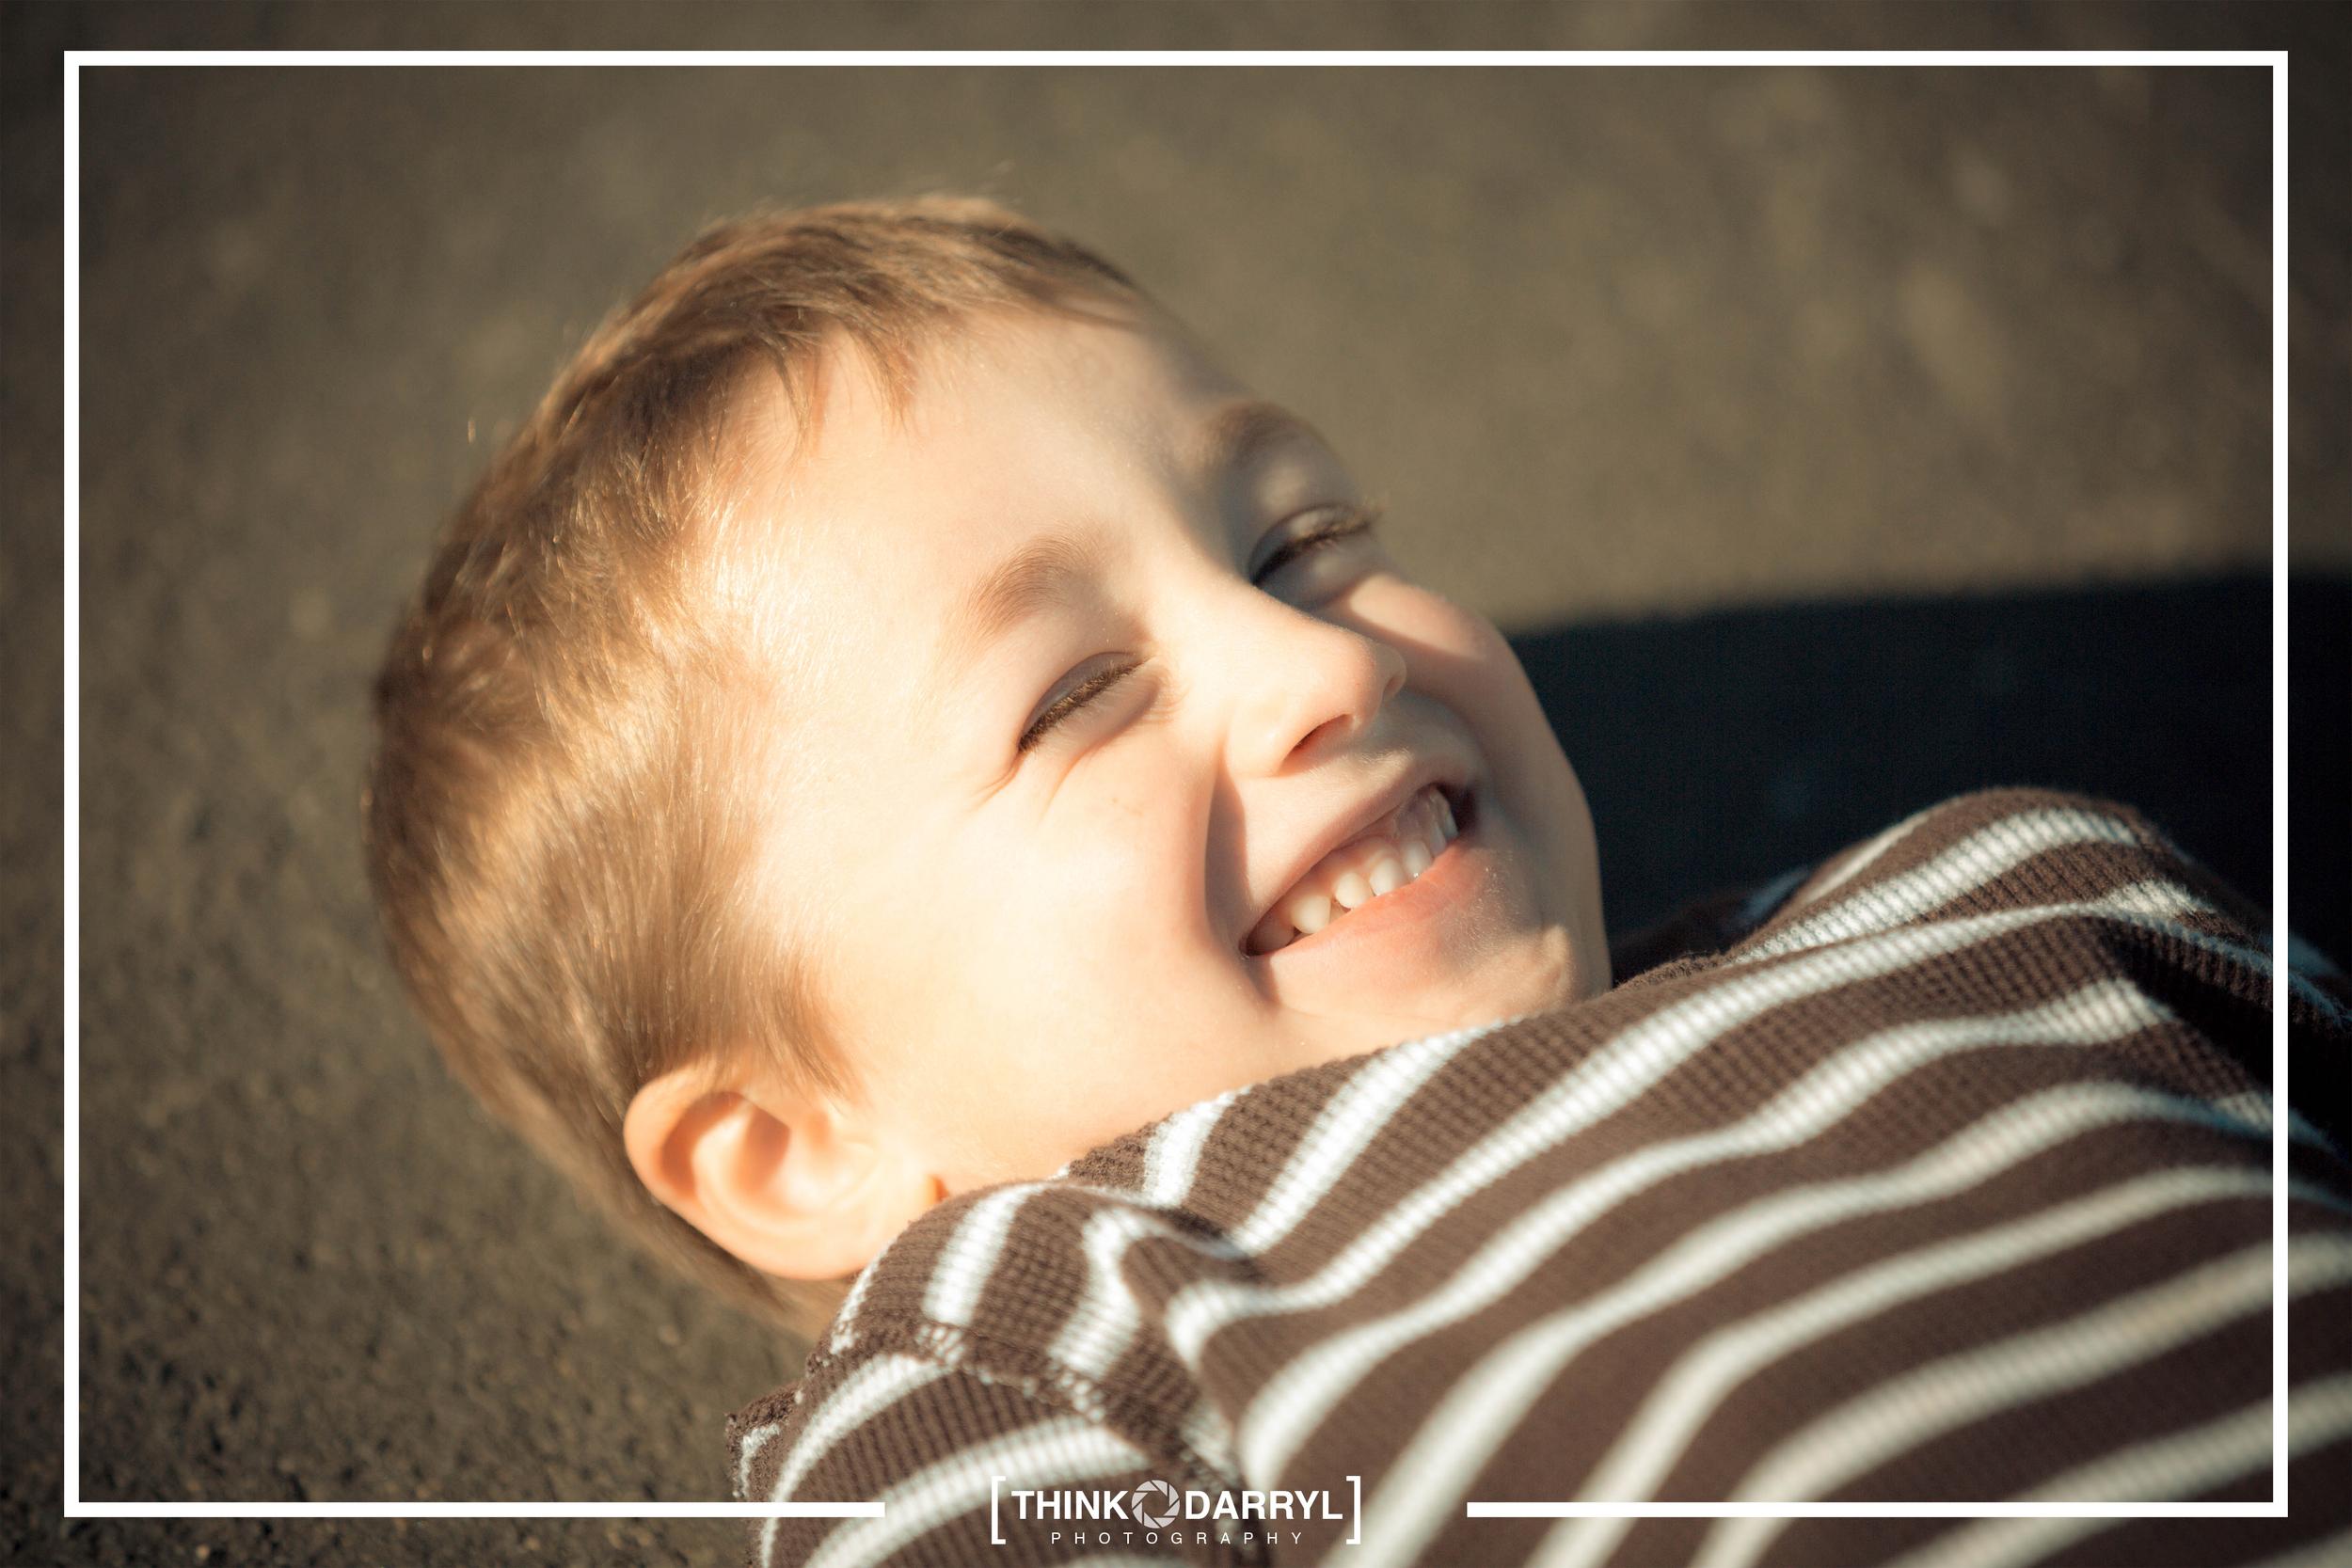 Lamming Family | Think Darryl Photography - Denver Family Photographer